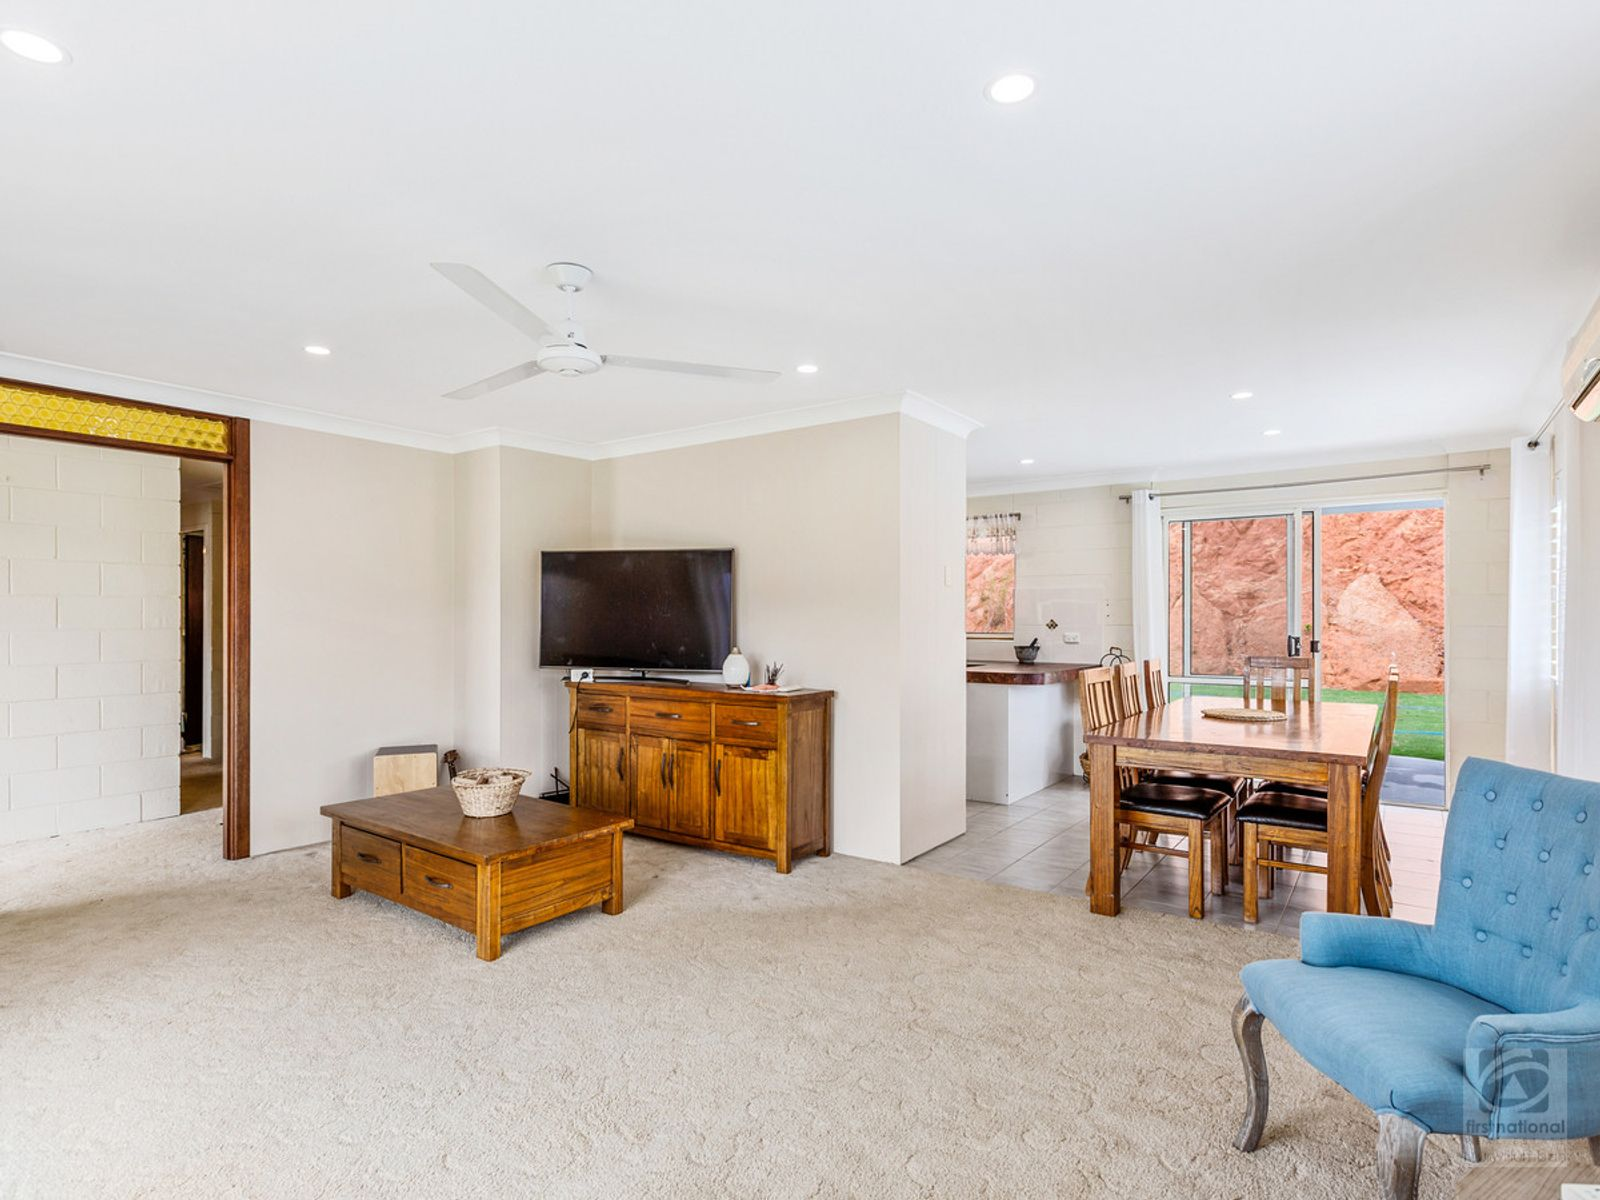 1279 Kyogle Road, Uki, NSW 2484